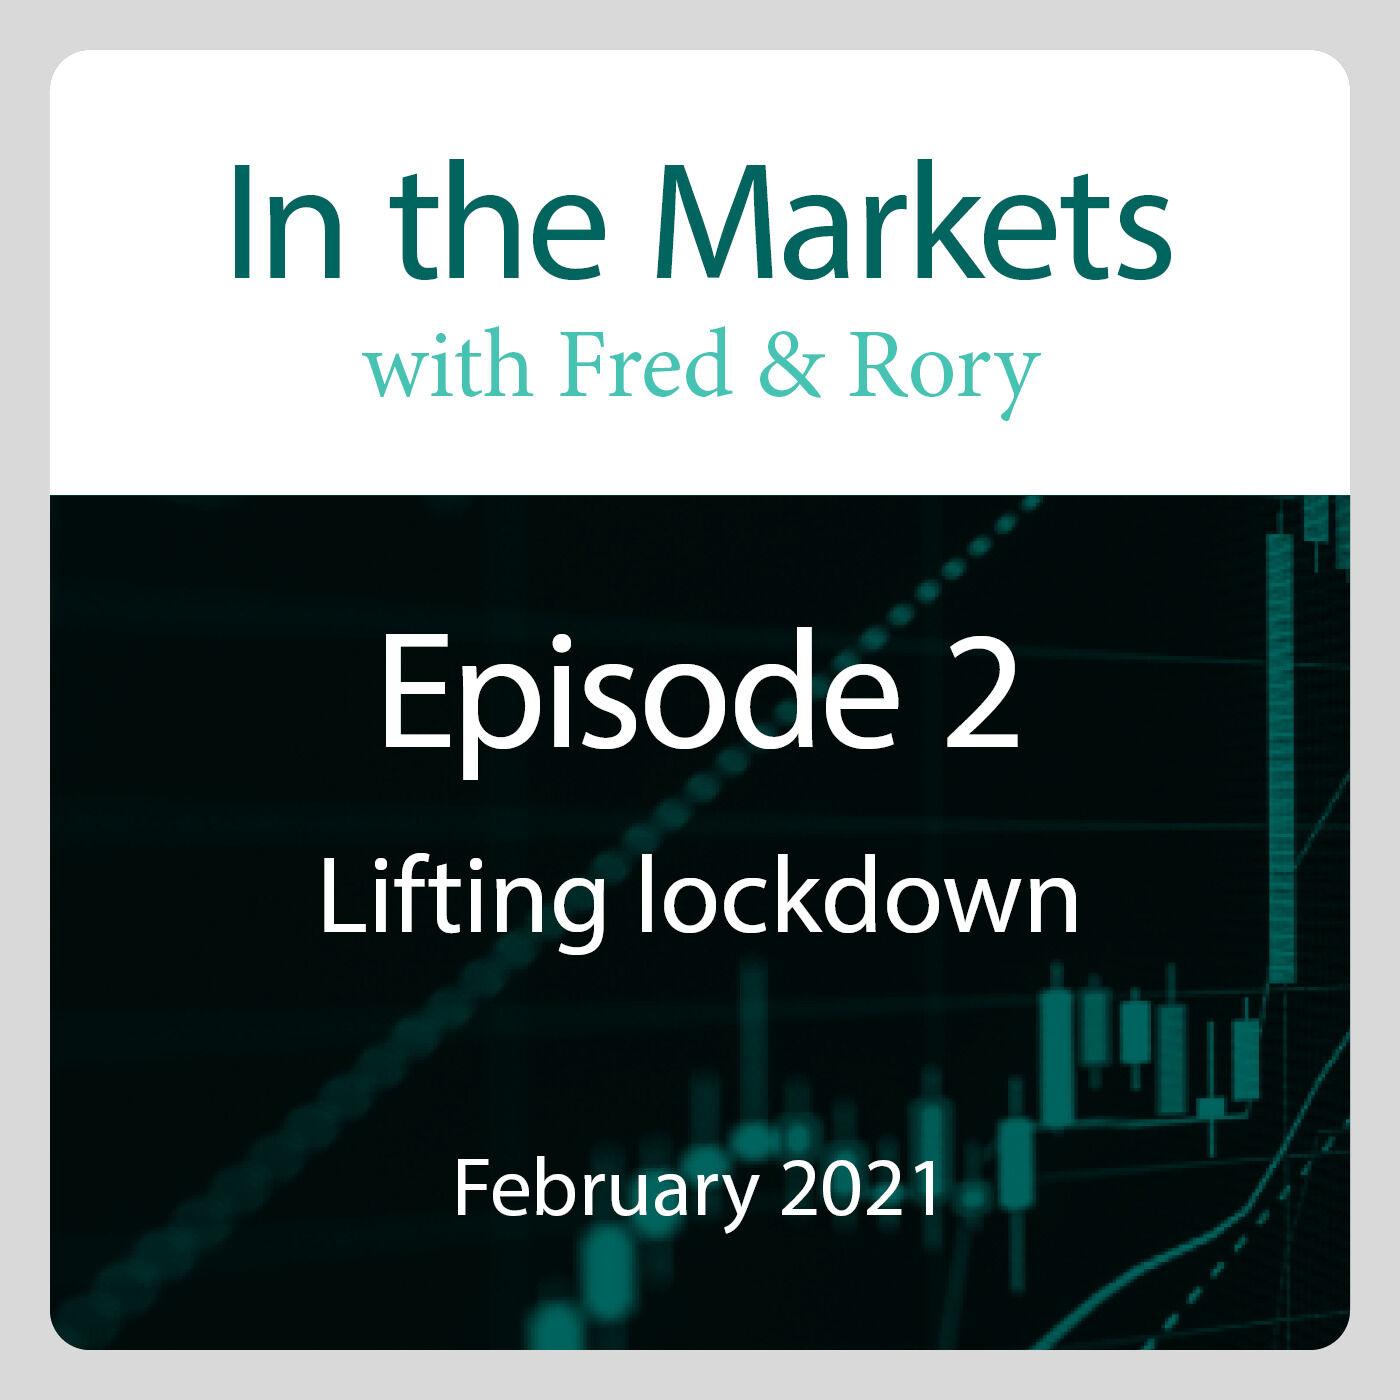 February 2021: Lifting lockdown & UK budget predictions